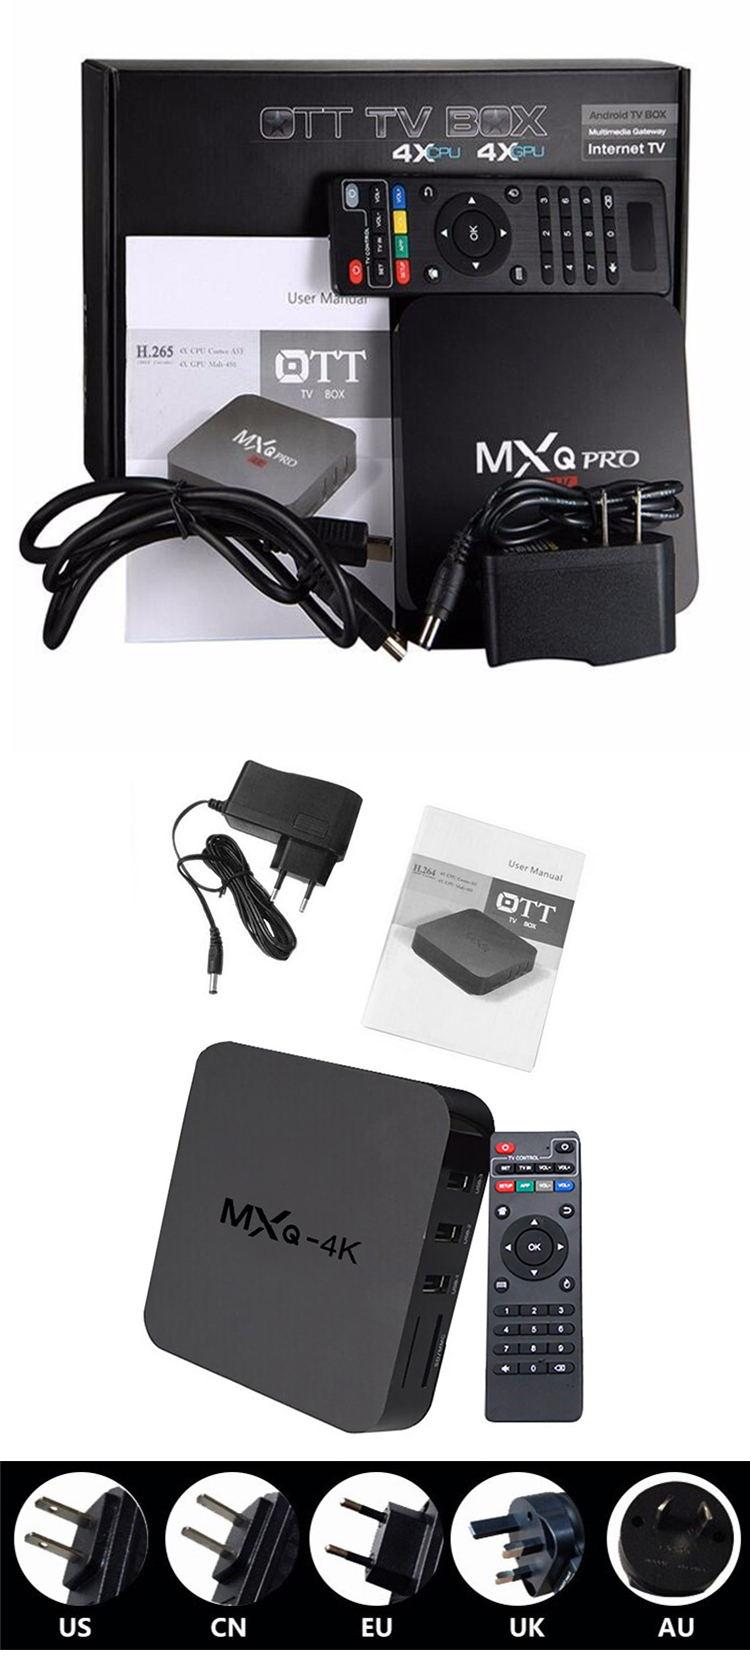 Hottest Tv Box Mxq Pro Allwinner Rockchip Amlogic S905w 4k Android Tv Box  Accept Customized Logo,Ui - Buy Amlogic S905x,Mxg Rk3229,Allwinner Android